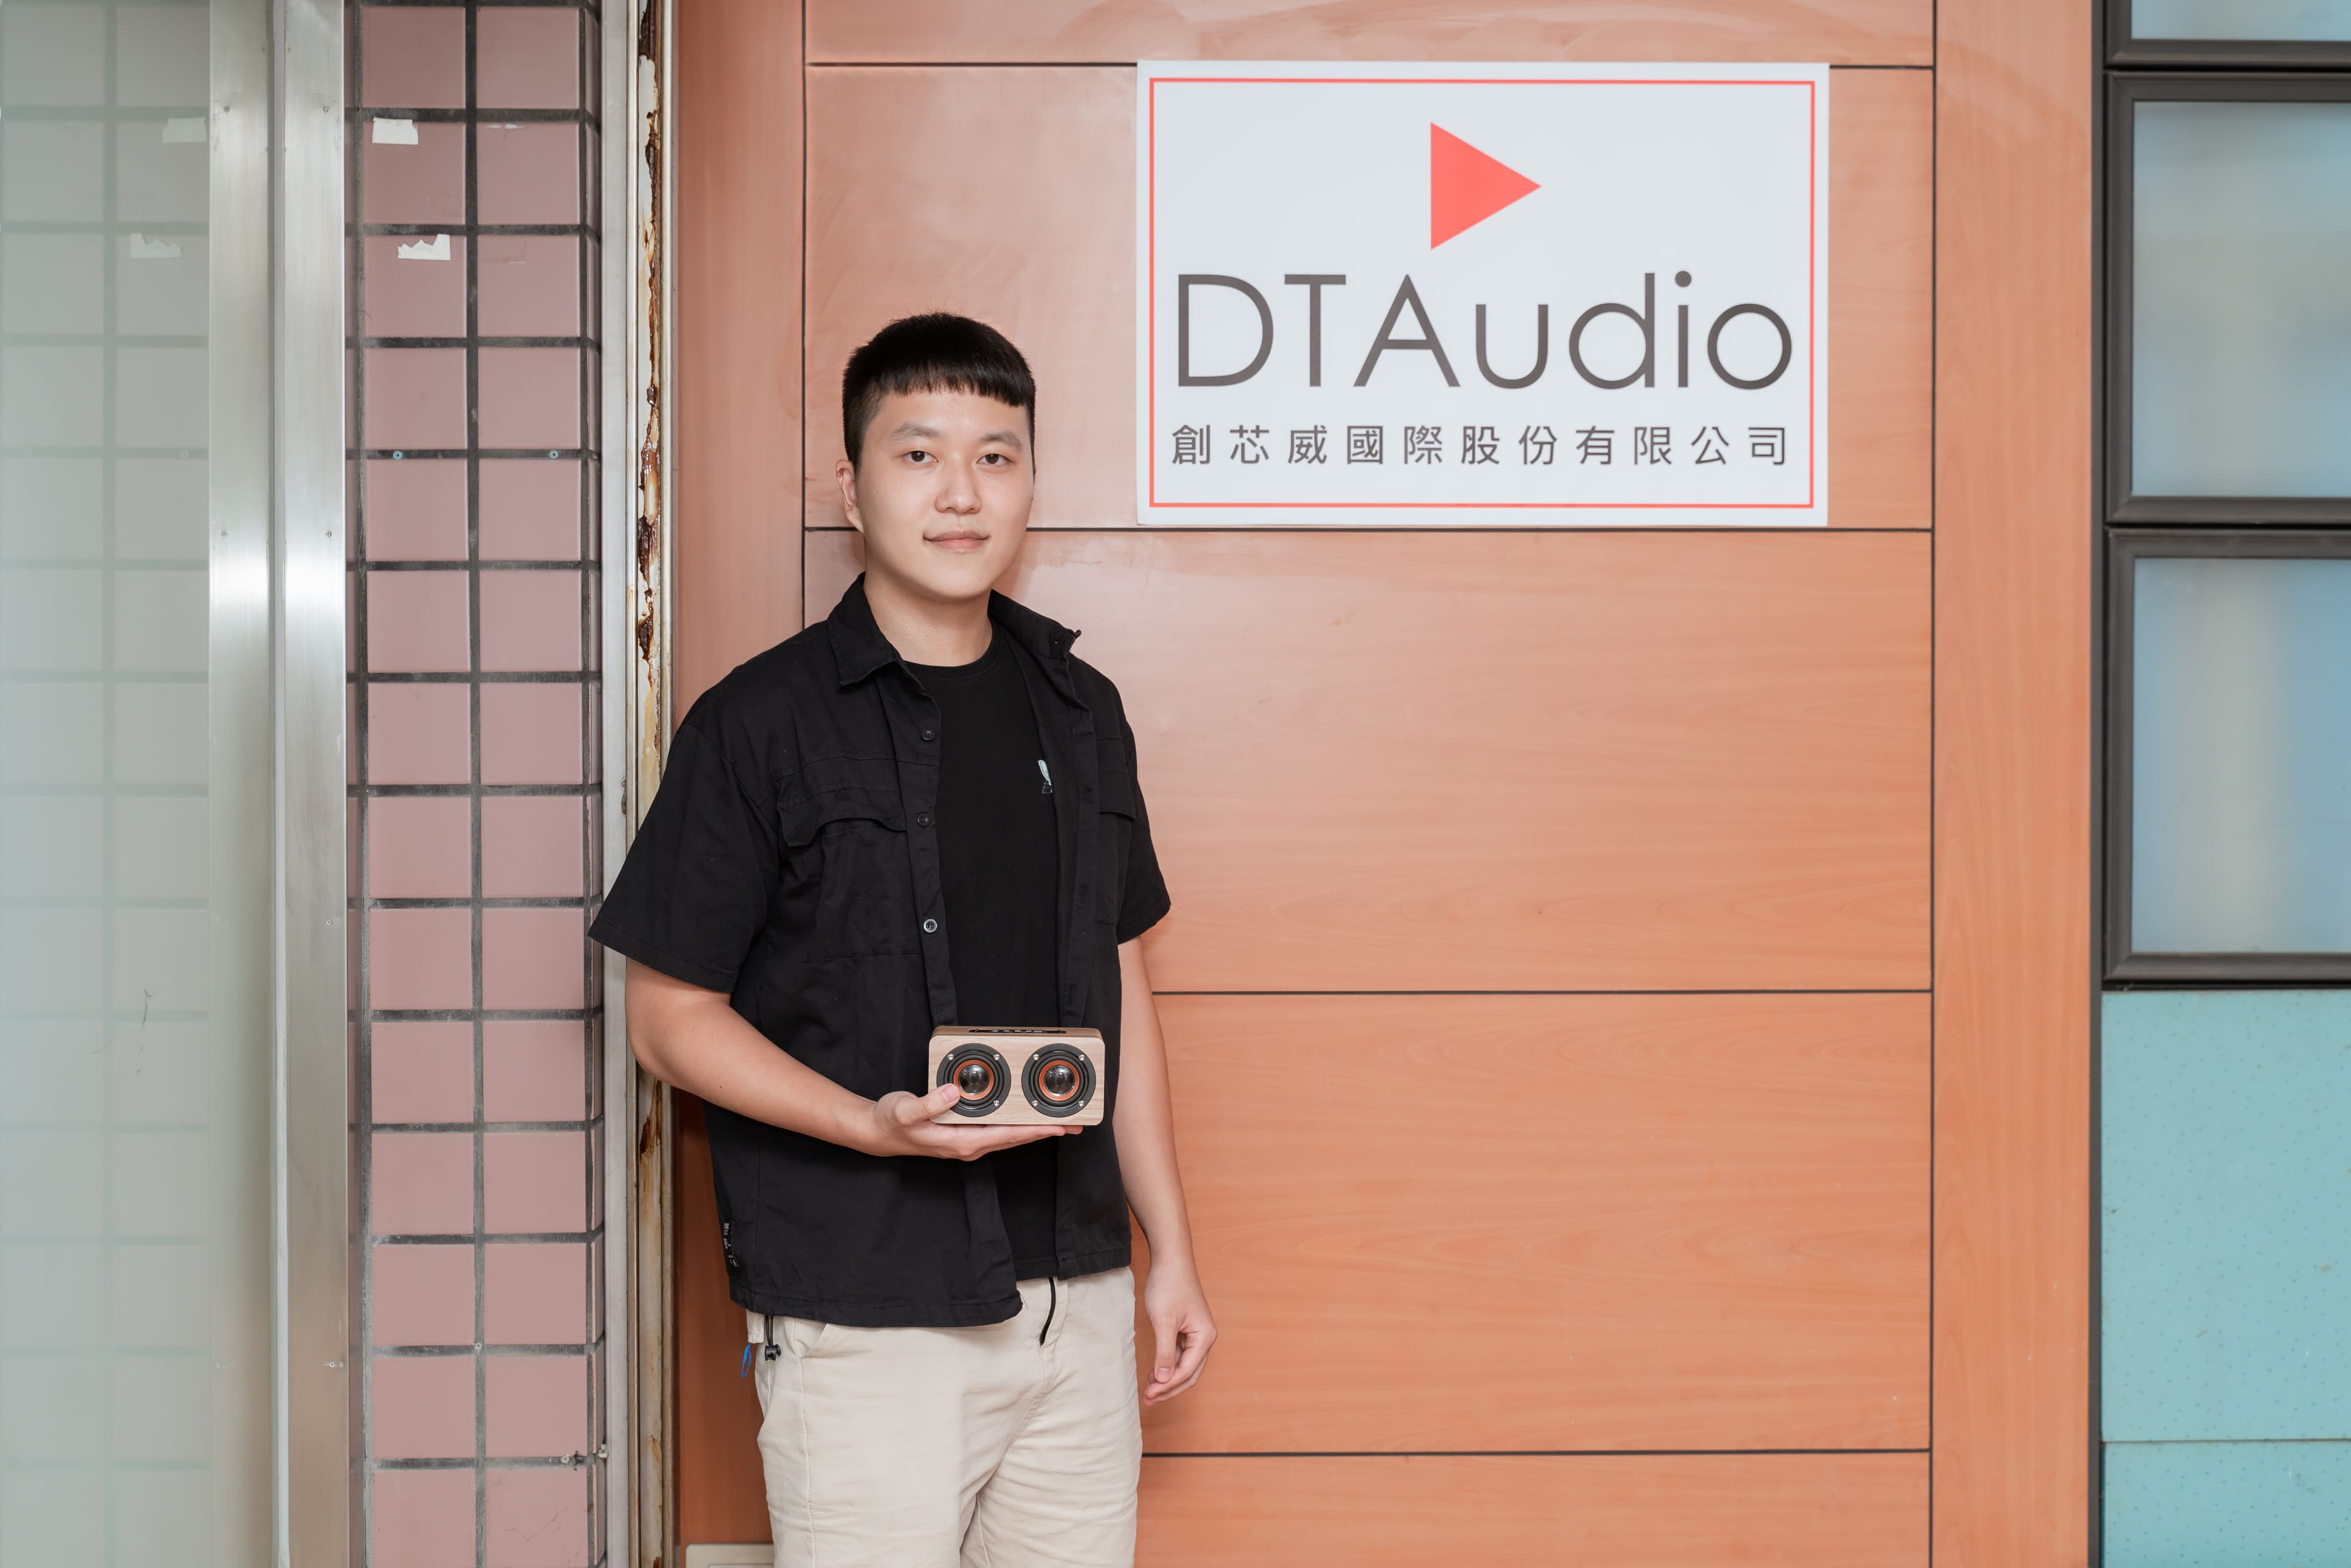 DTAudio:畢業即創業,精準眼光瞄準藍海市場,打造平價 3C 電商王國